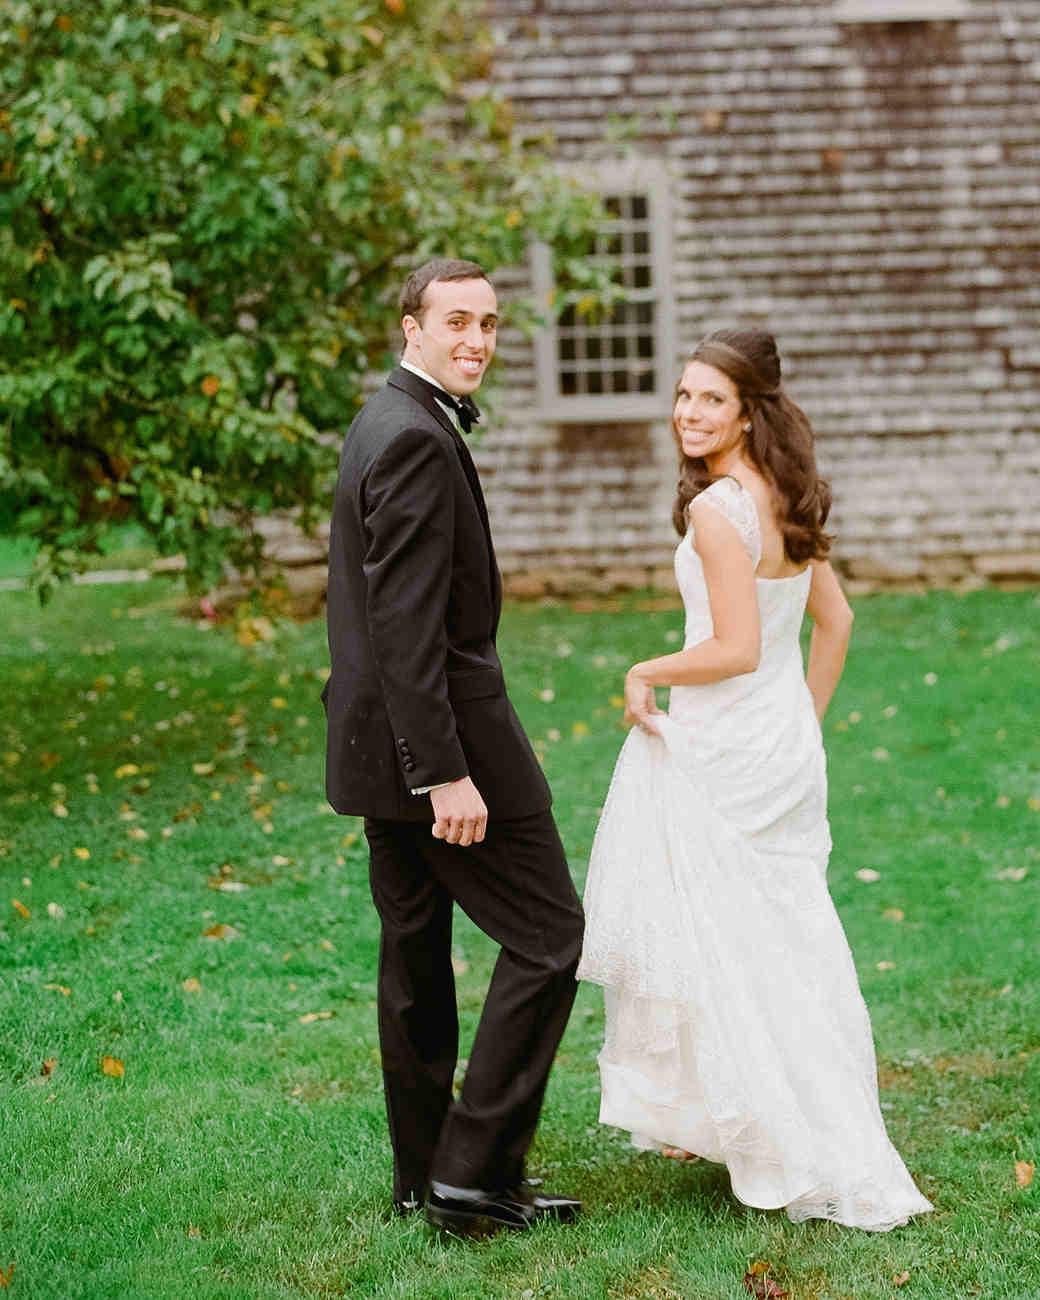 lindsay-garrett-wedding-couple-0803-s111850-0415.jpg